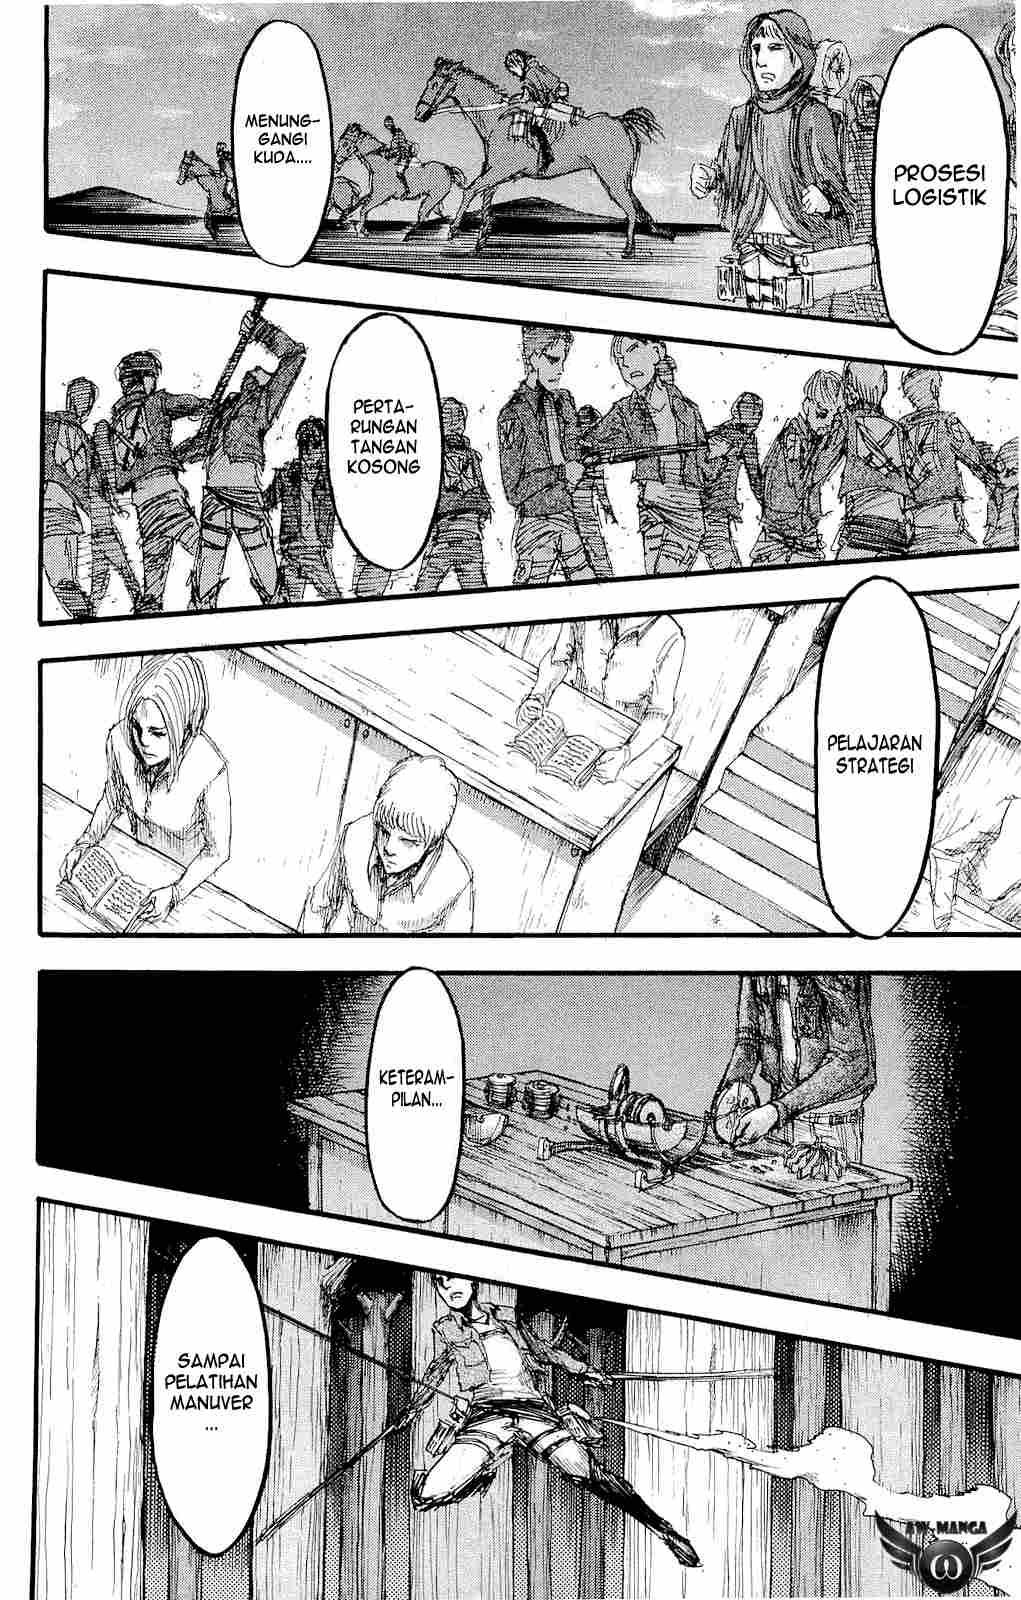 Komik shingeki no kyojin 018 - sekarang apa yang harus dilakukan 19 Indonesia shingeki no kyojin 018 - sekarang apa yang harus dilakukan Terbaru 25|Baca Manga Komik Indonesia|